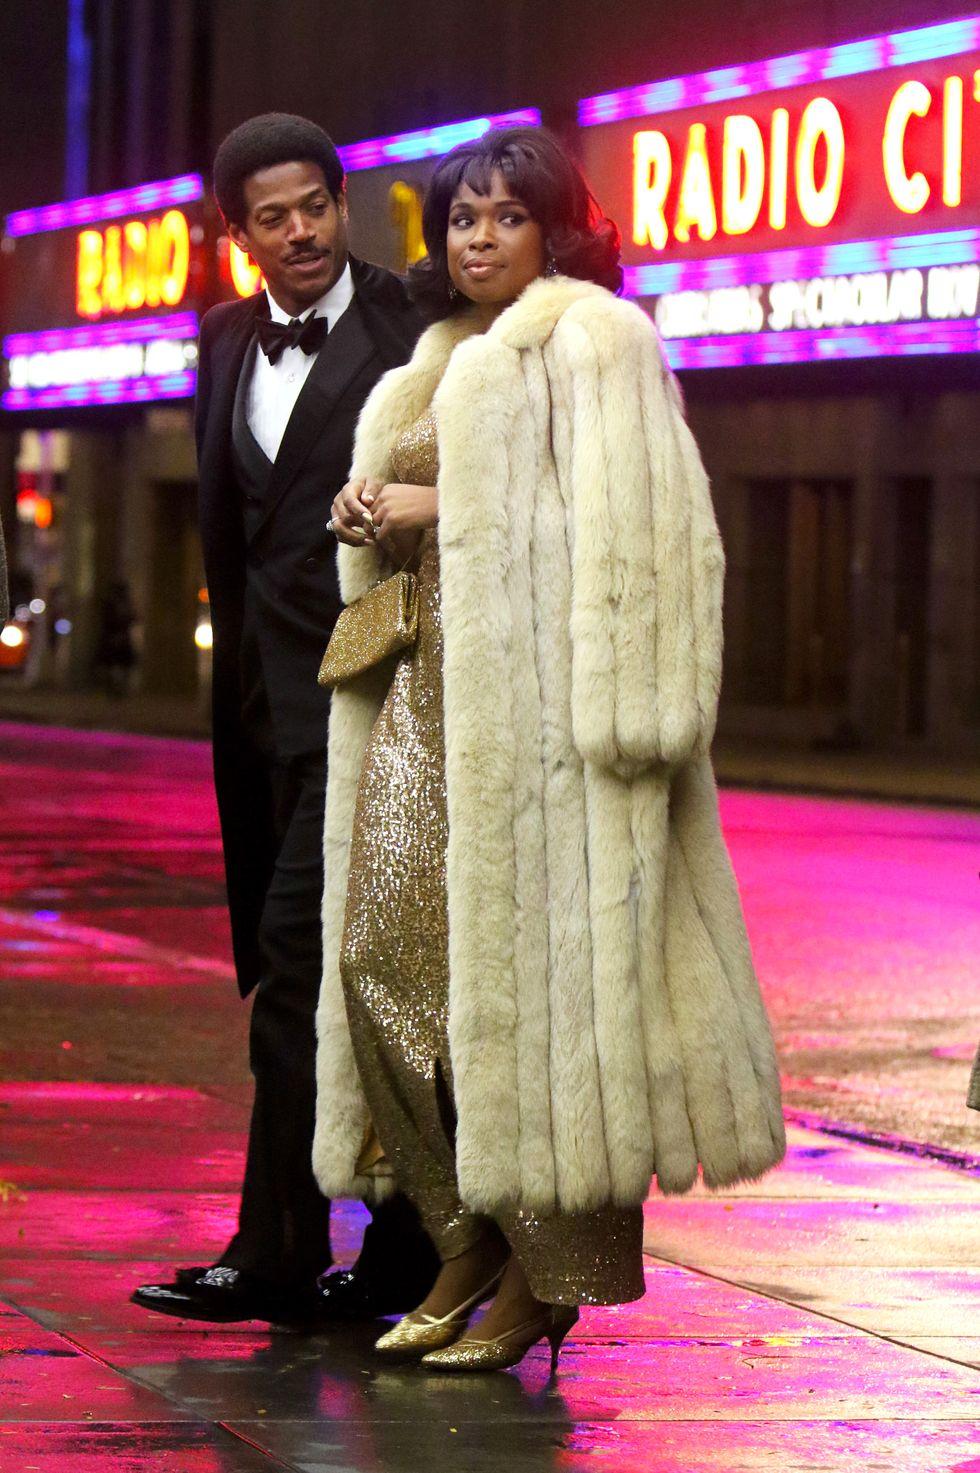 Watch Jennifer Hudson Belt 'Respect' in First Trailer for Aretha Franklin Biopic